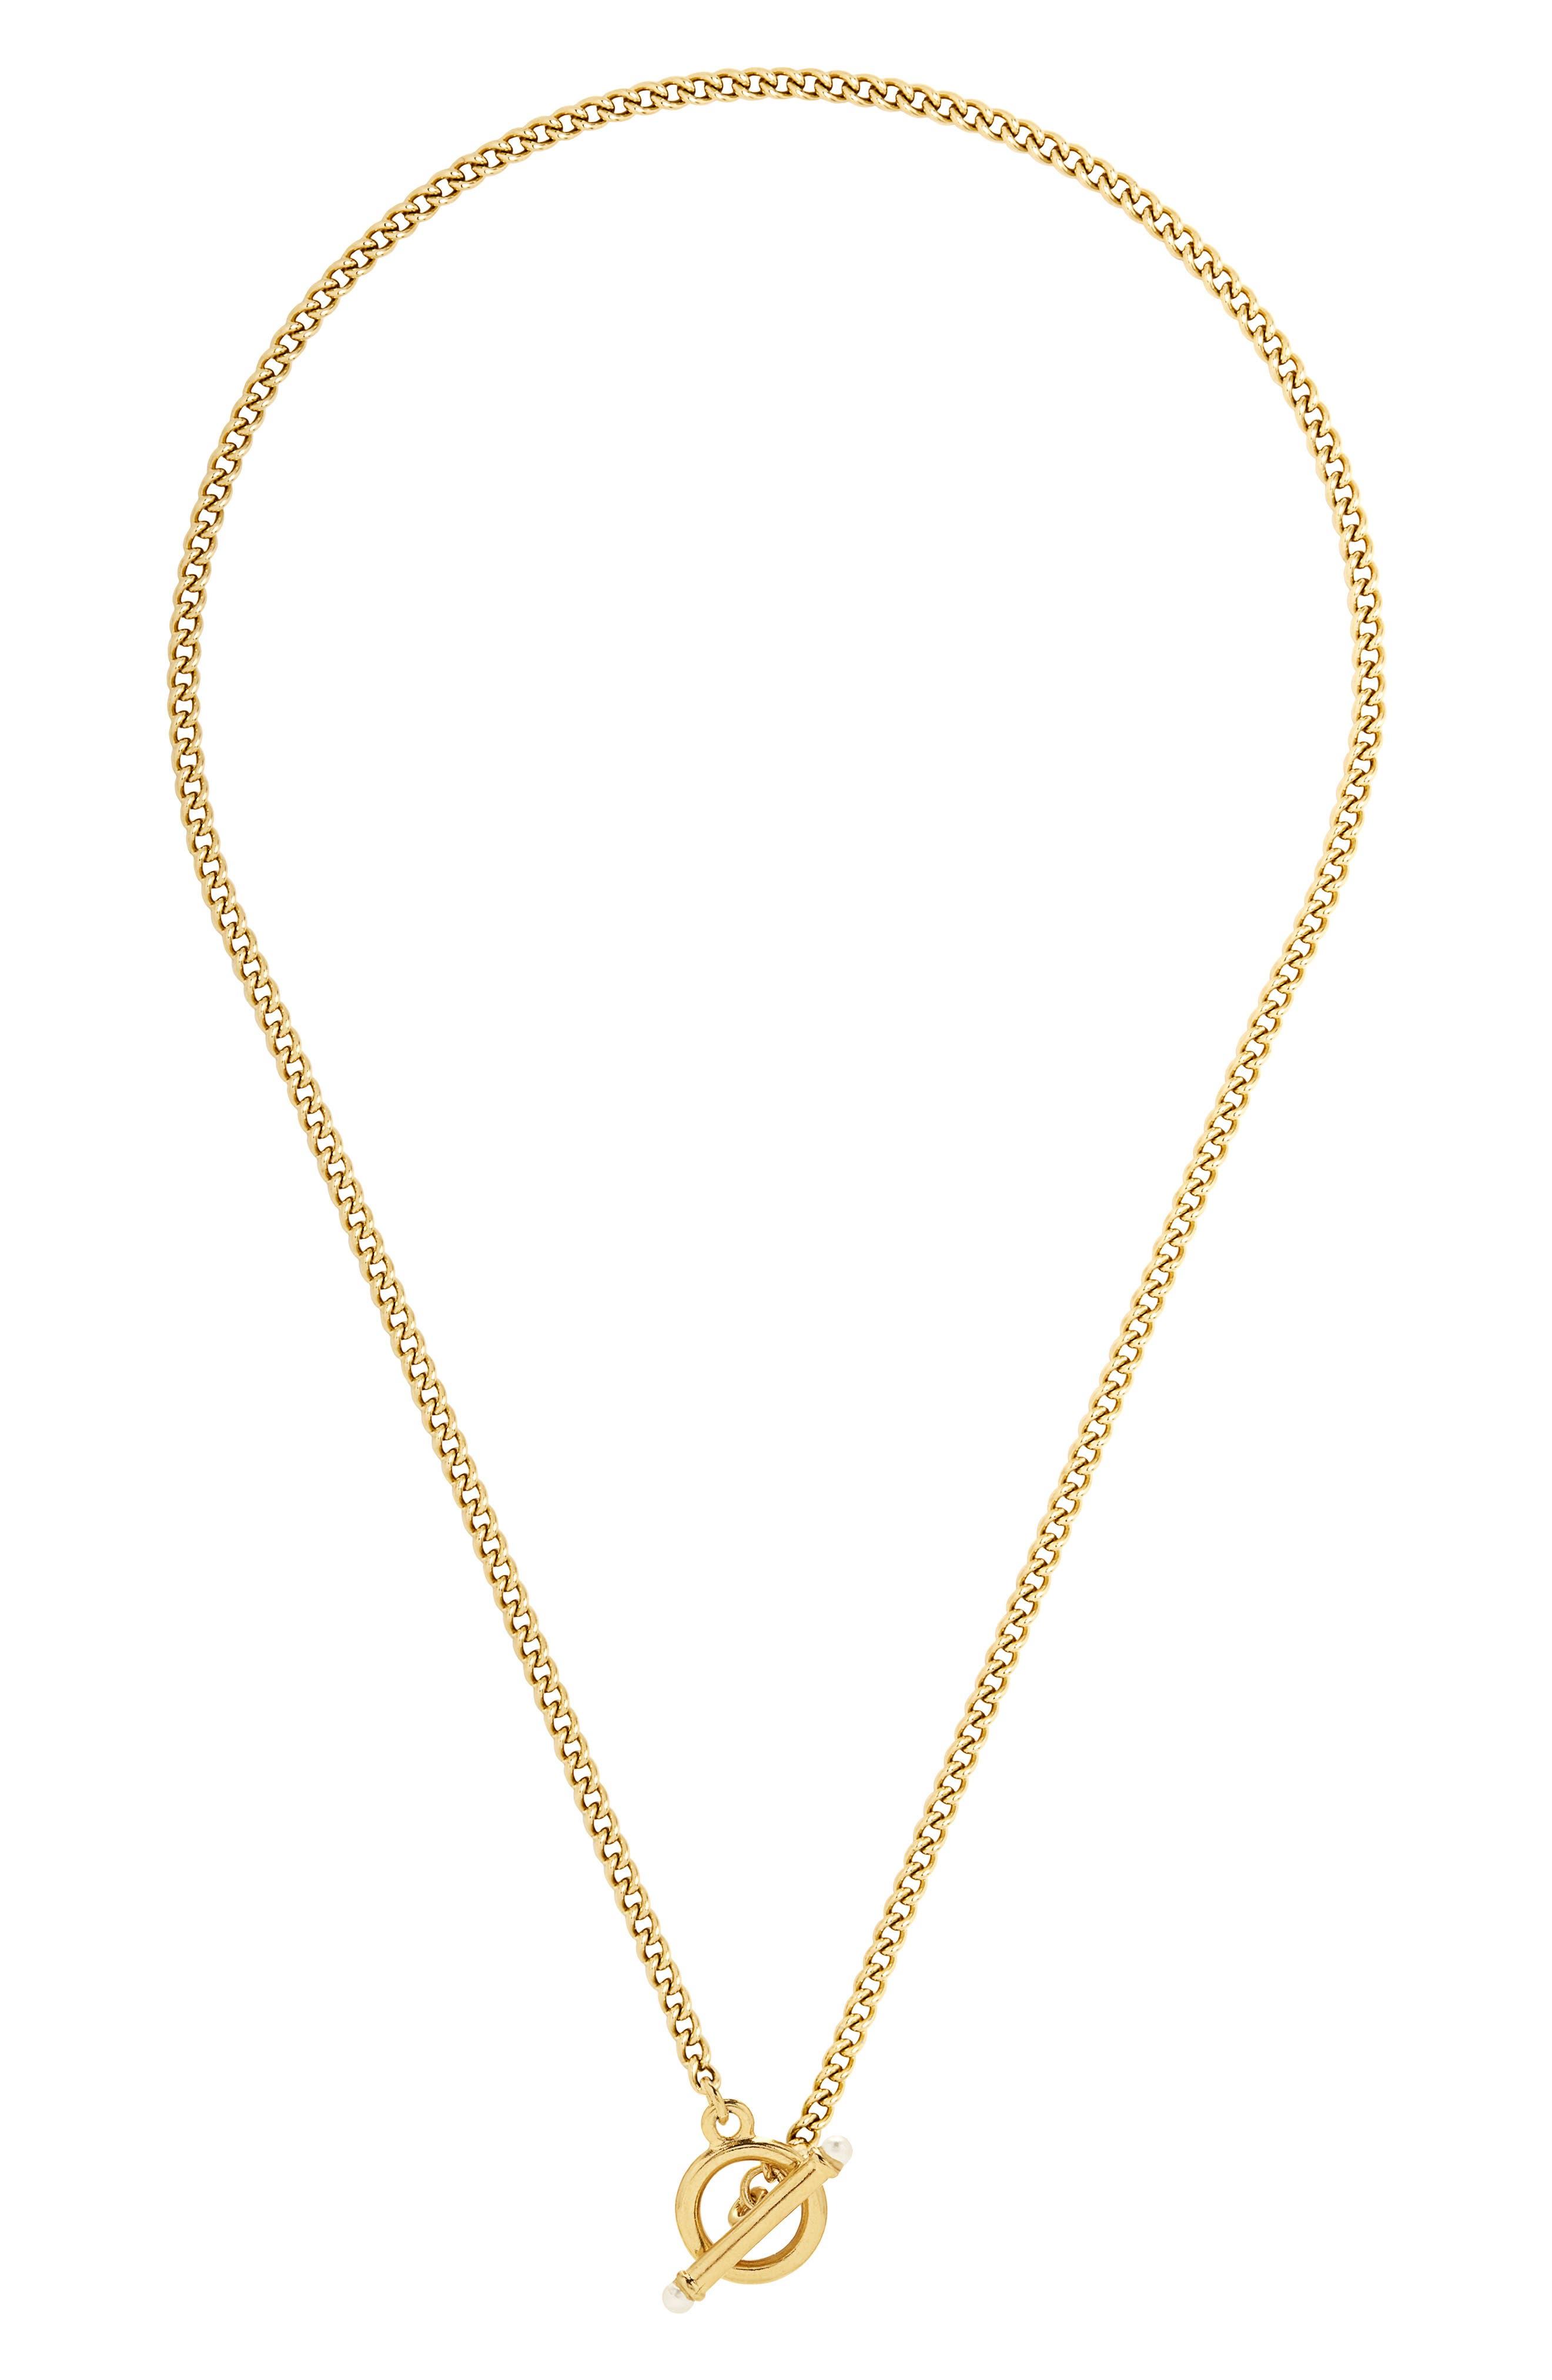 Stella Imitation Pearl Toggle Necklace